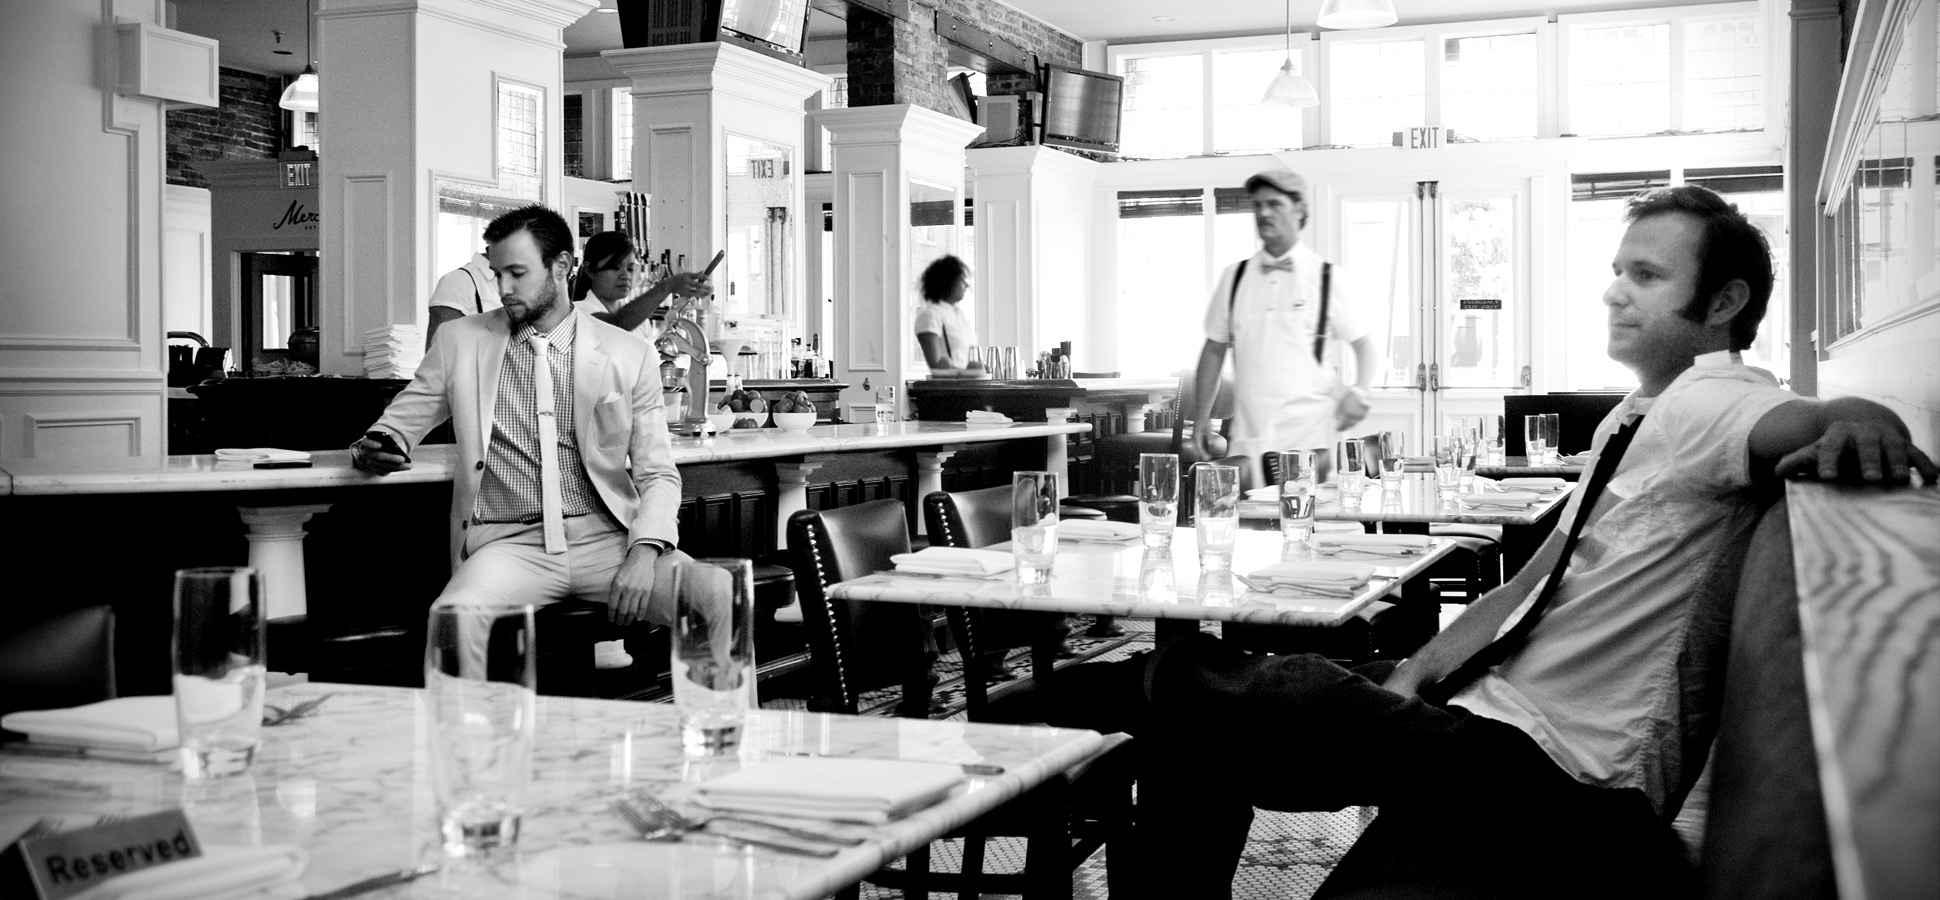 Nashville Restaurateurs Dish About Their Secret Sauce